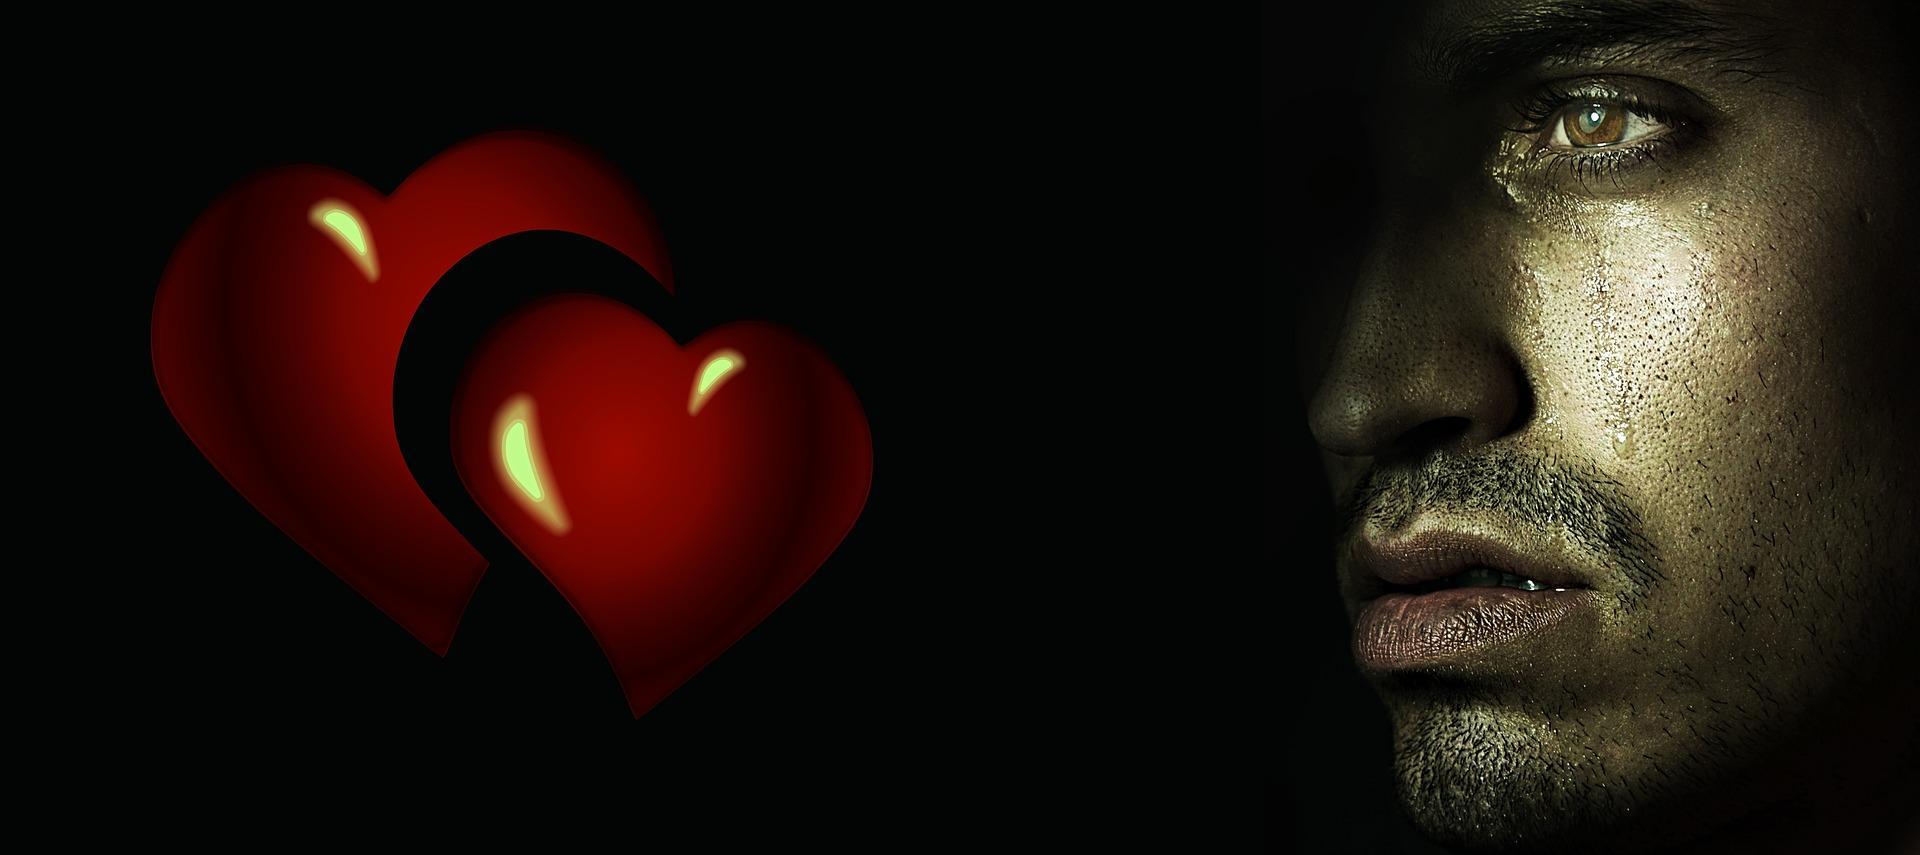 Online dating Kilkenny. Meet men and women - Mamba